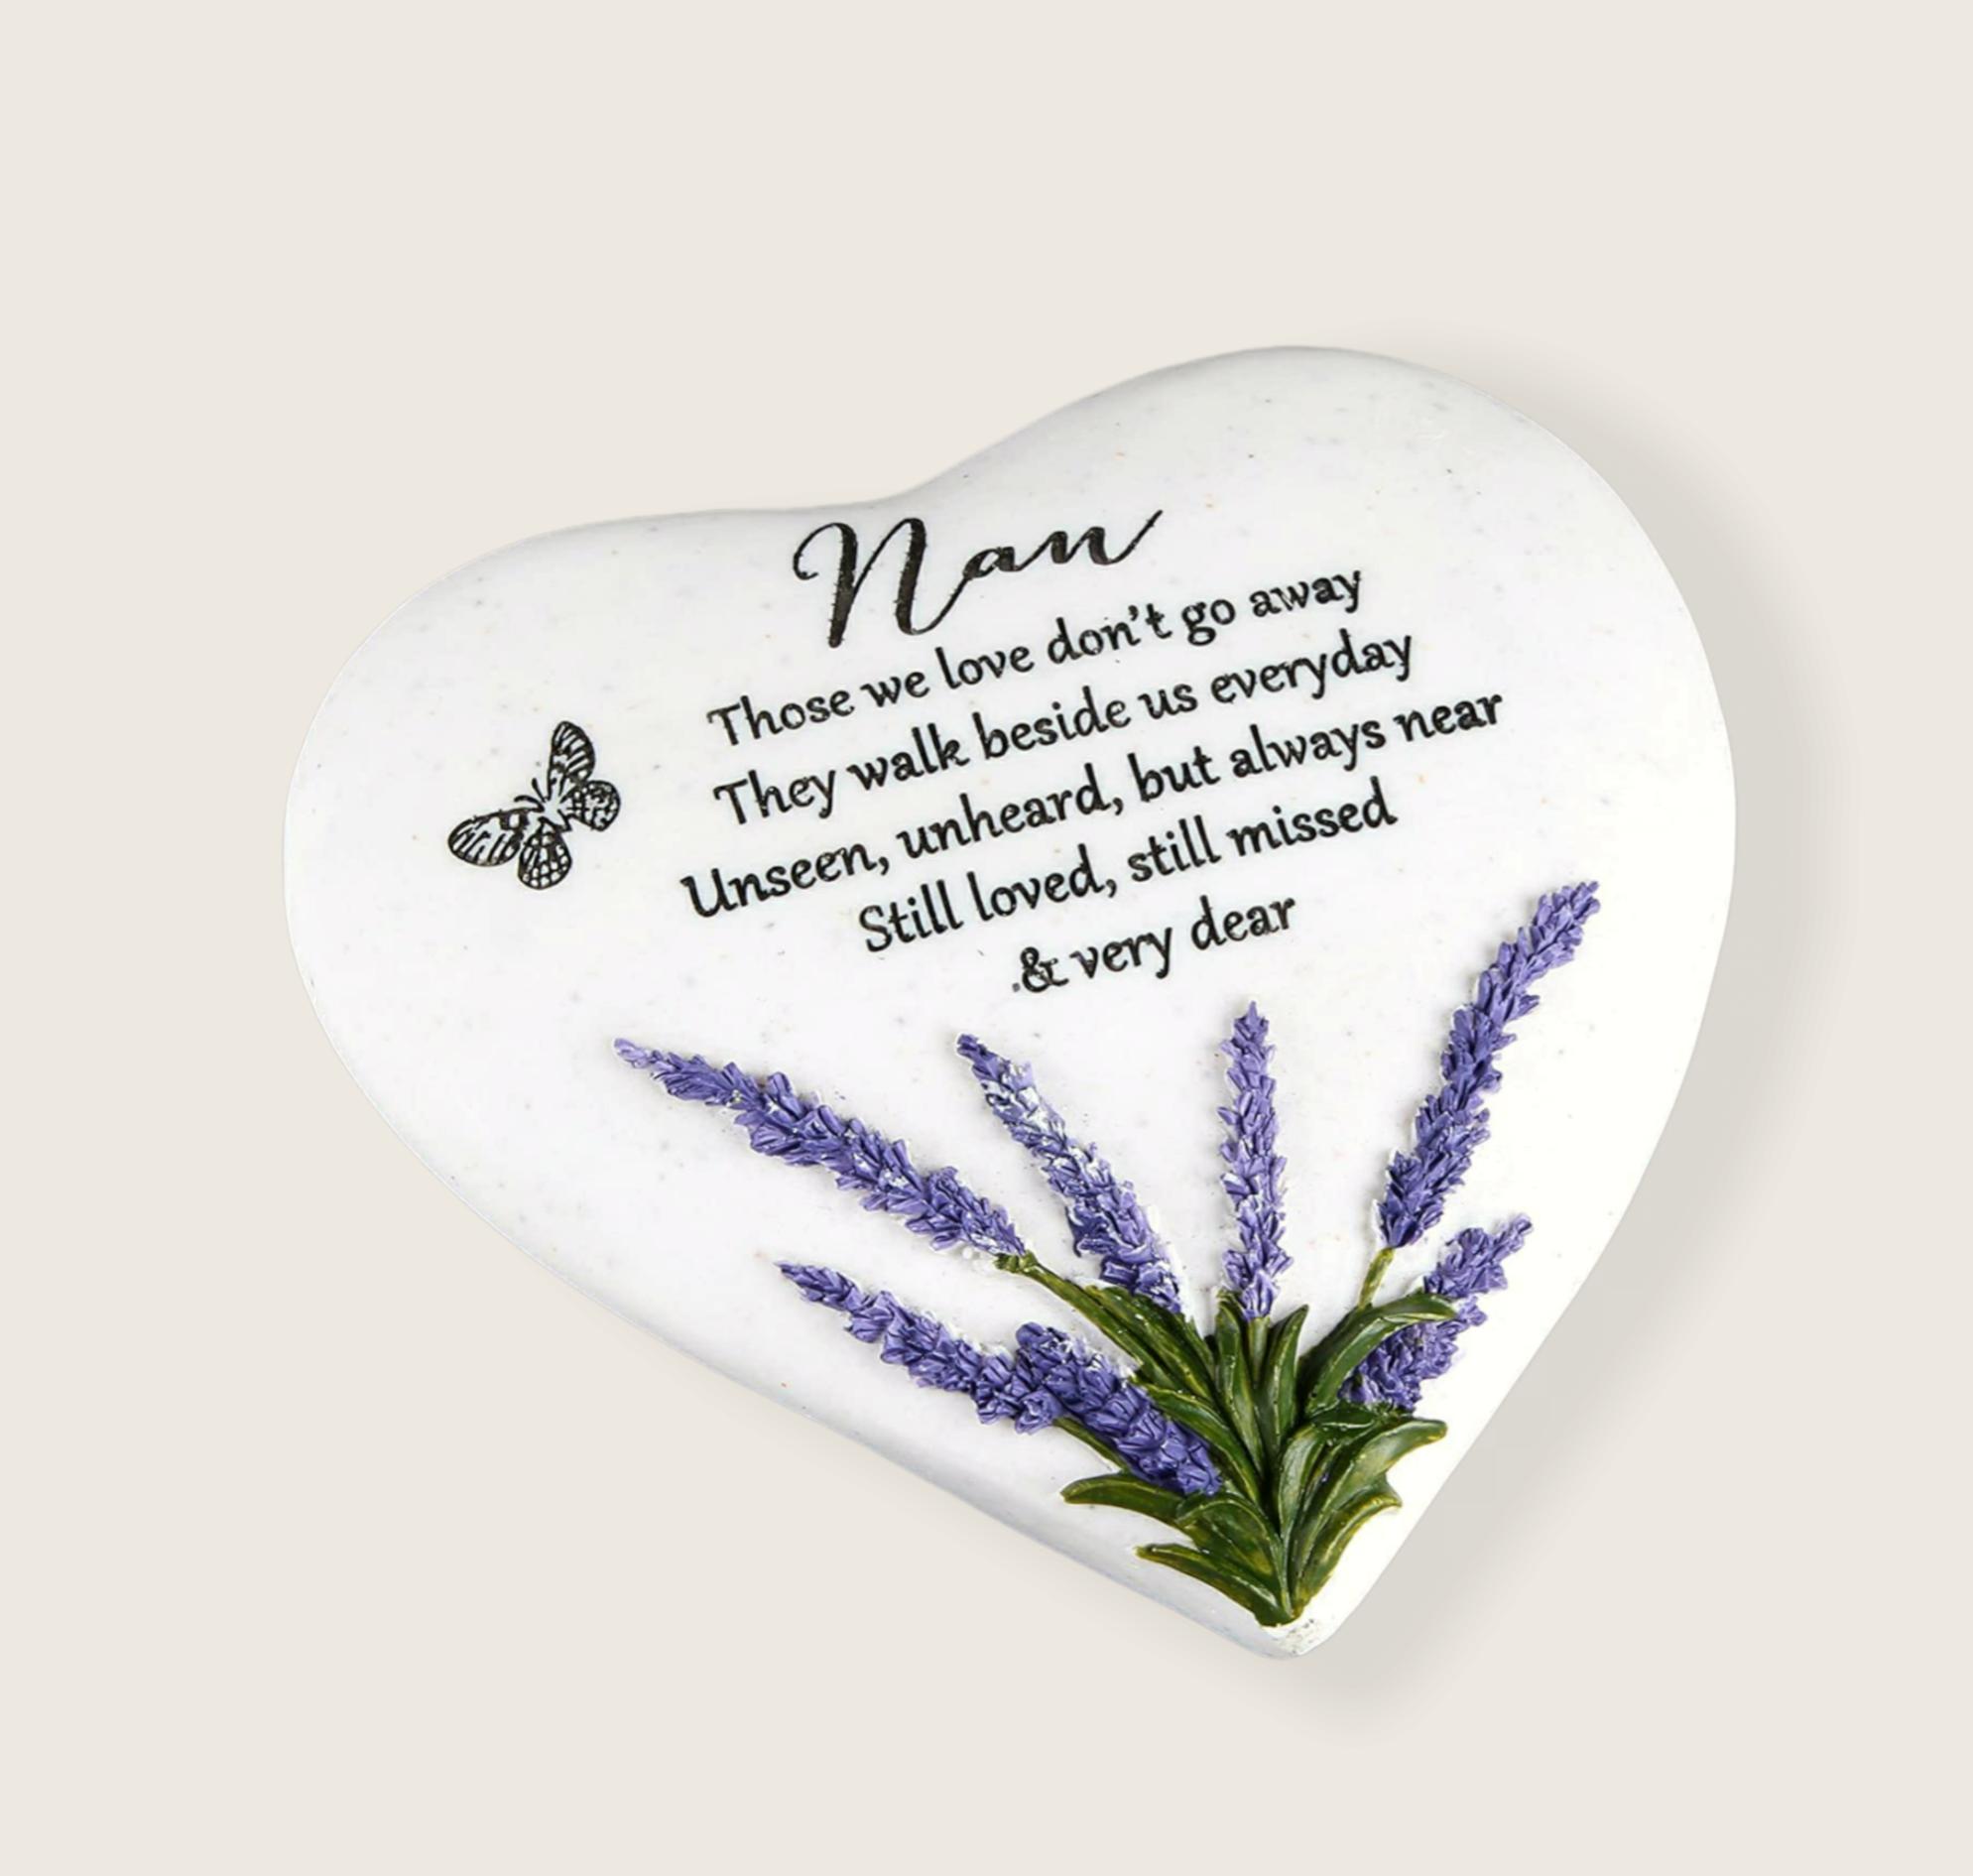 My Nan – Heart Shape Outdoor Memorial Plaque with Lavender design